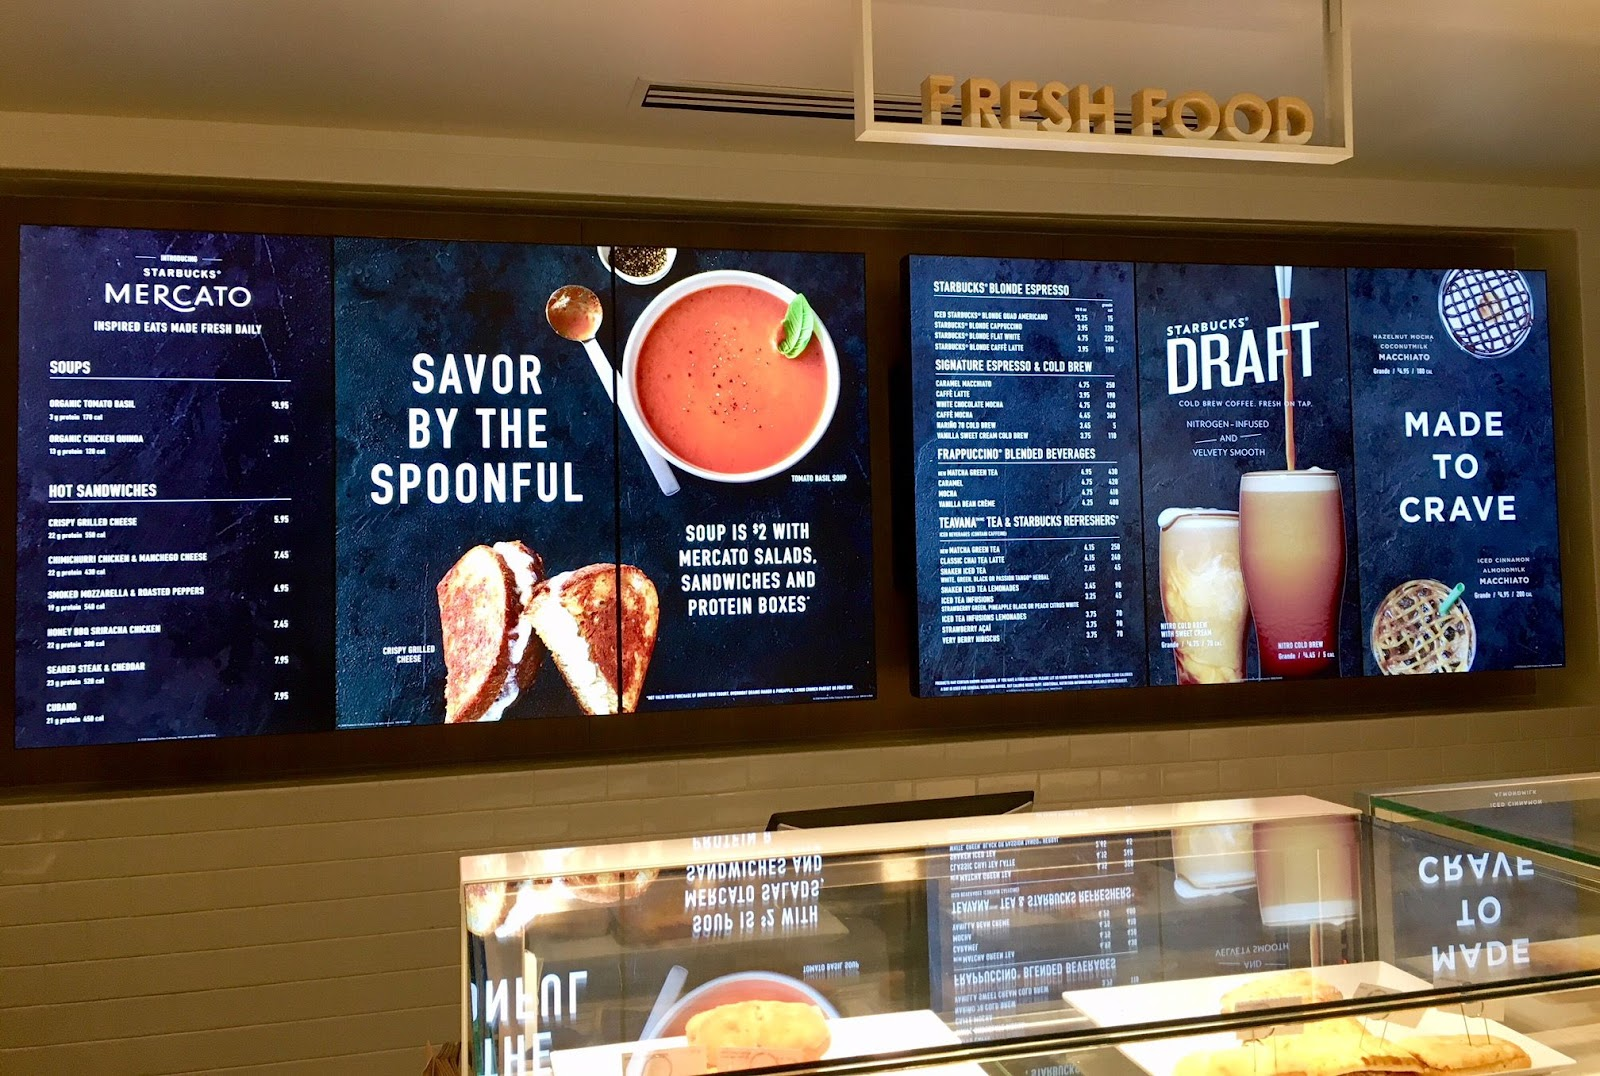 Starbucks uses digital menu boards in many of their locations